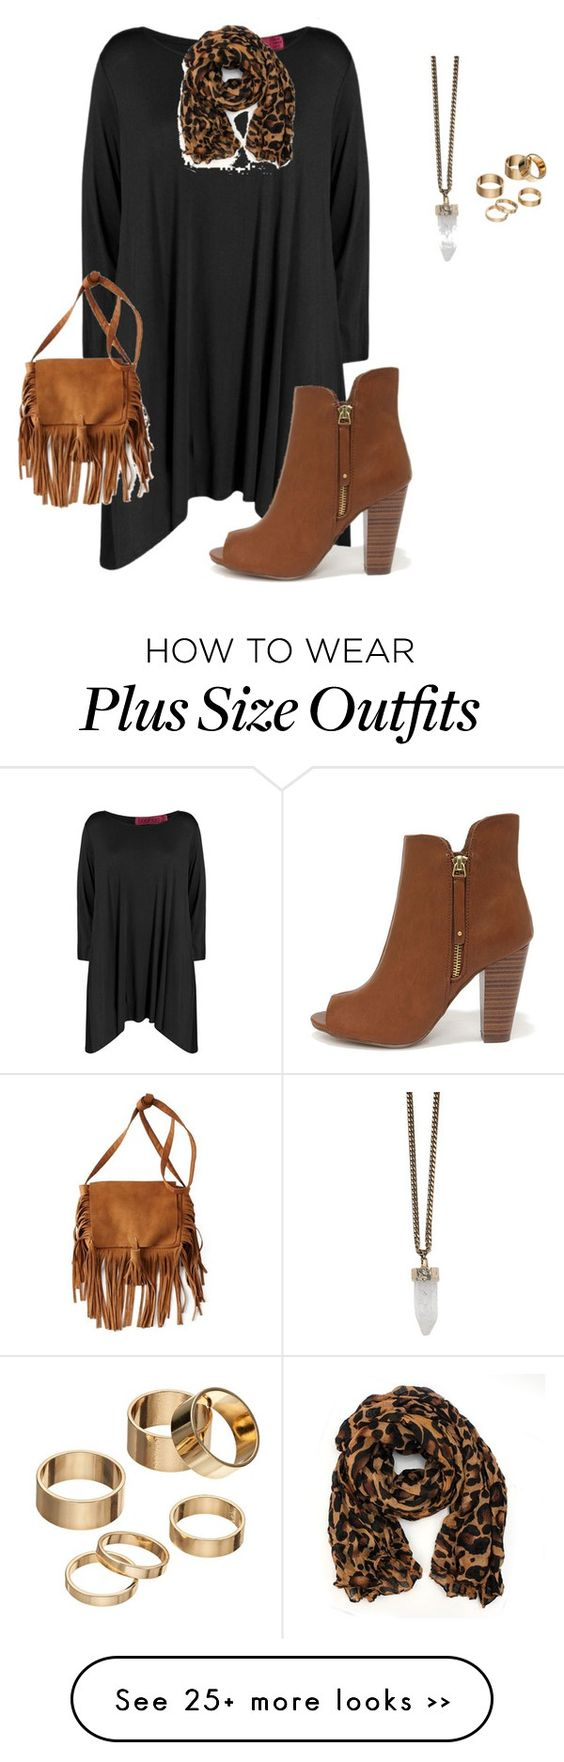 11 plus size short black dresses for fashionable outfits - 11 plus size short black dresses for fashionable outfits